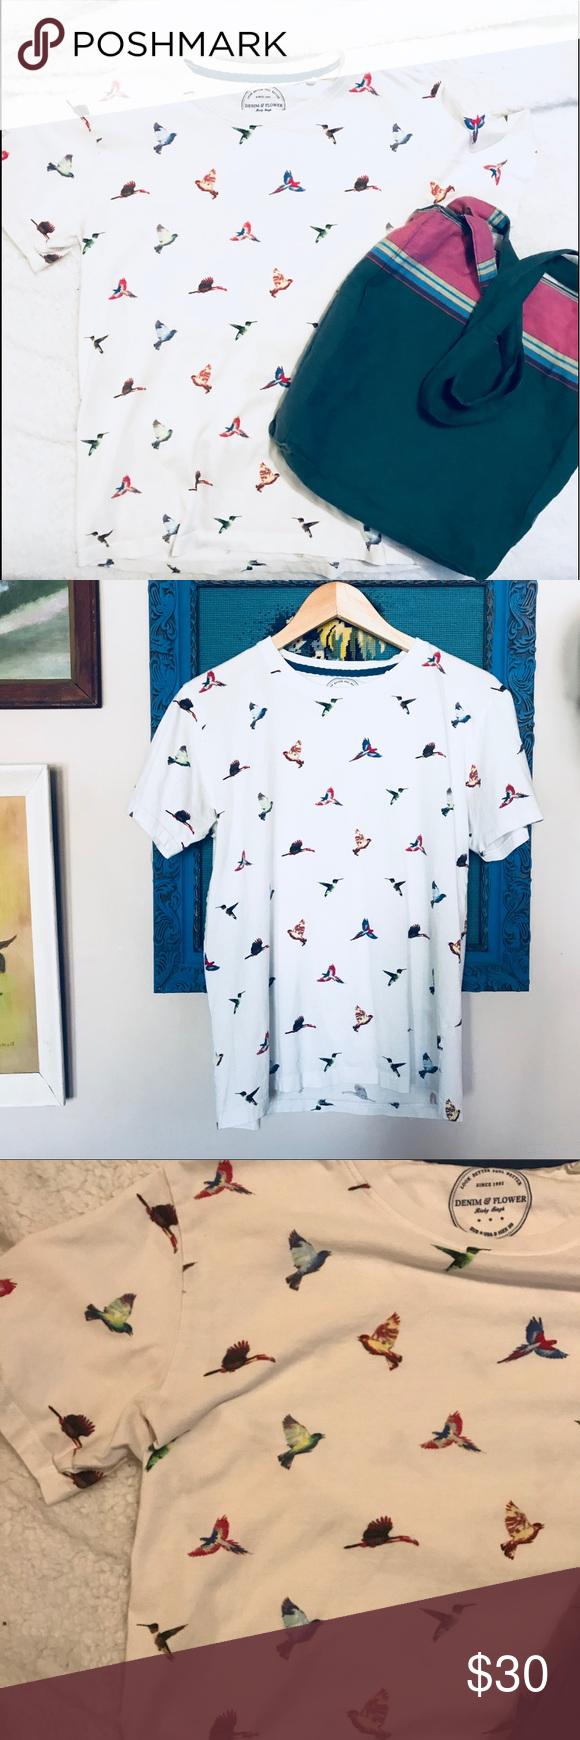 02609fcc51 Denim   Flower Tropical Bird T-shirt Denim   Flower Tropical Bird T-shirt